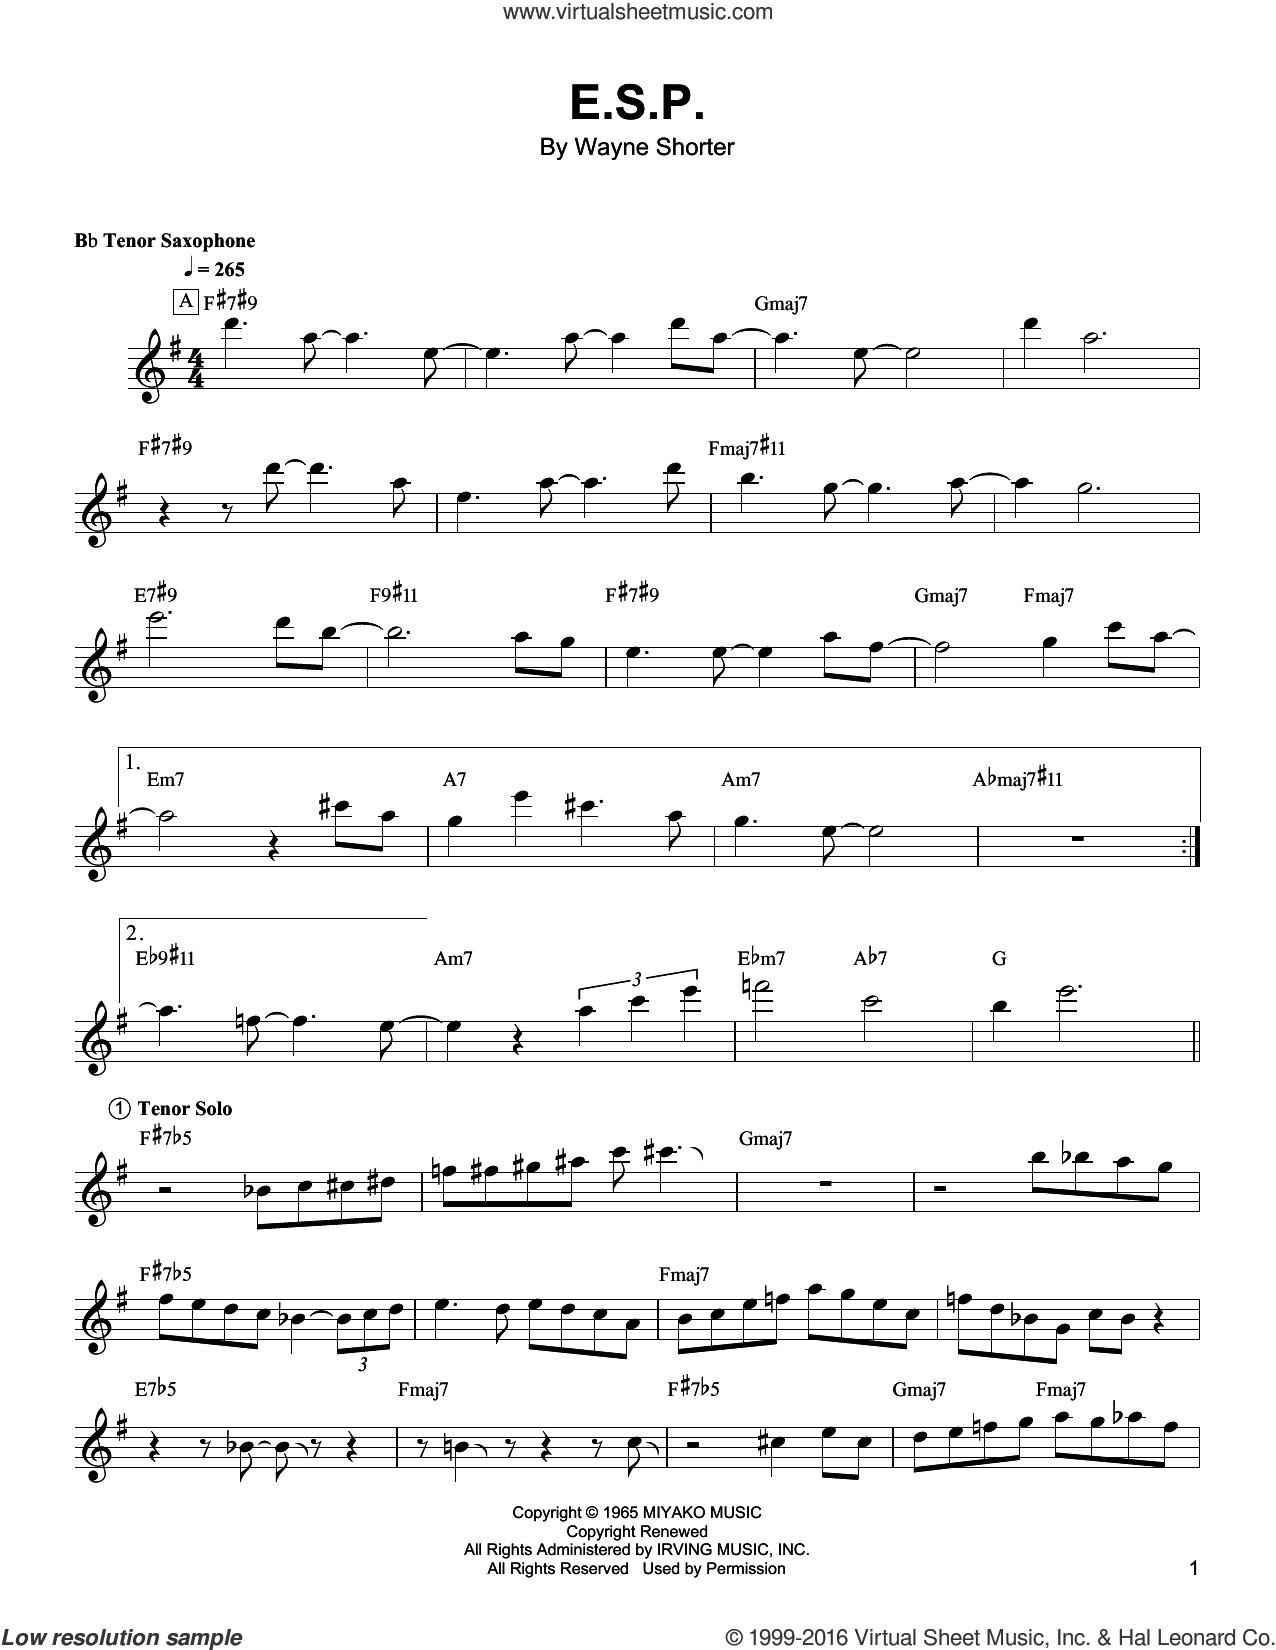 E.S.P. sheet music for tenor saxophone solo (transcription) by Wayne Shorter, intermediate tenor saxophone (transcription)